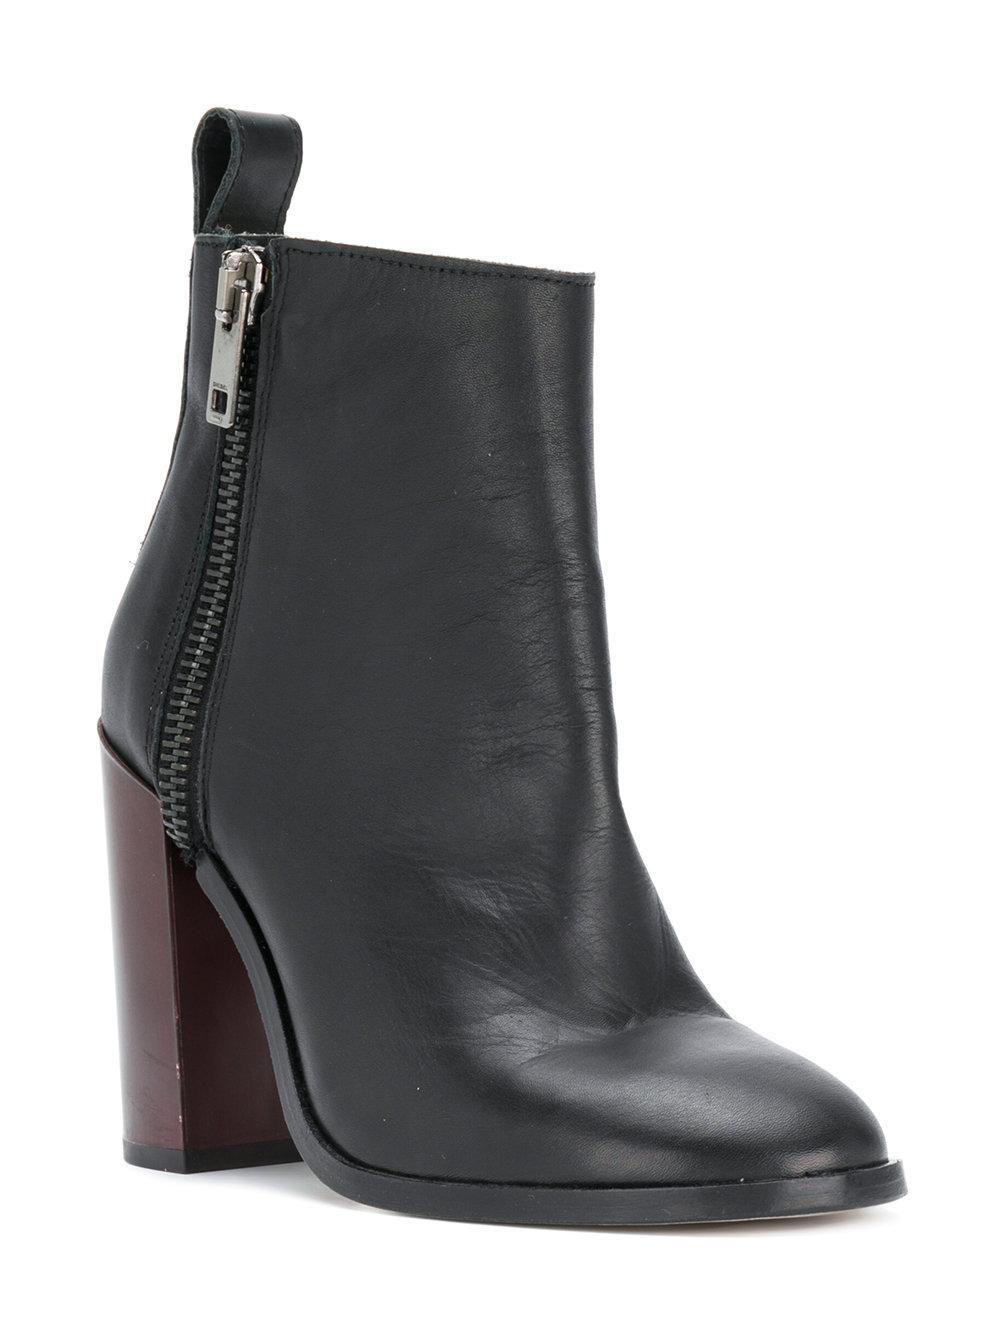 Diesel Zip heeled ankle boots CZg7h0z